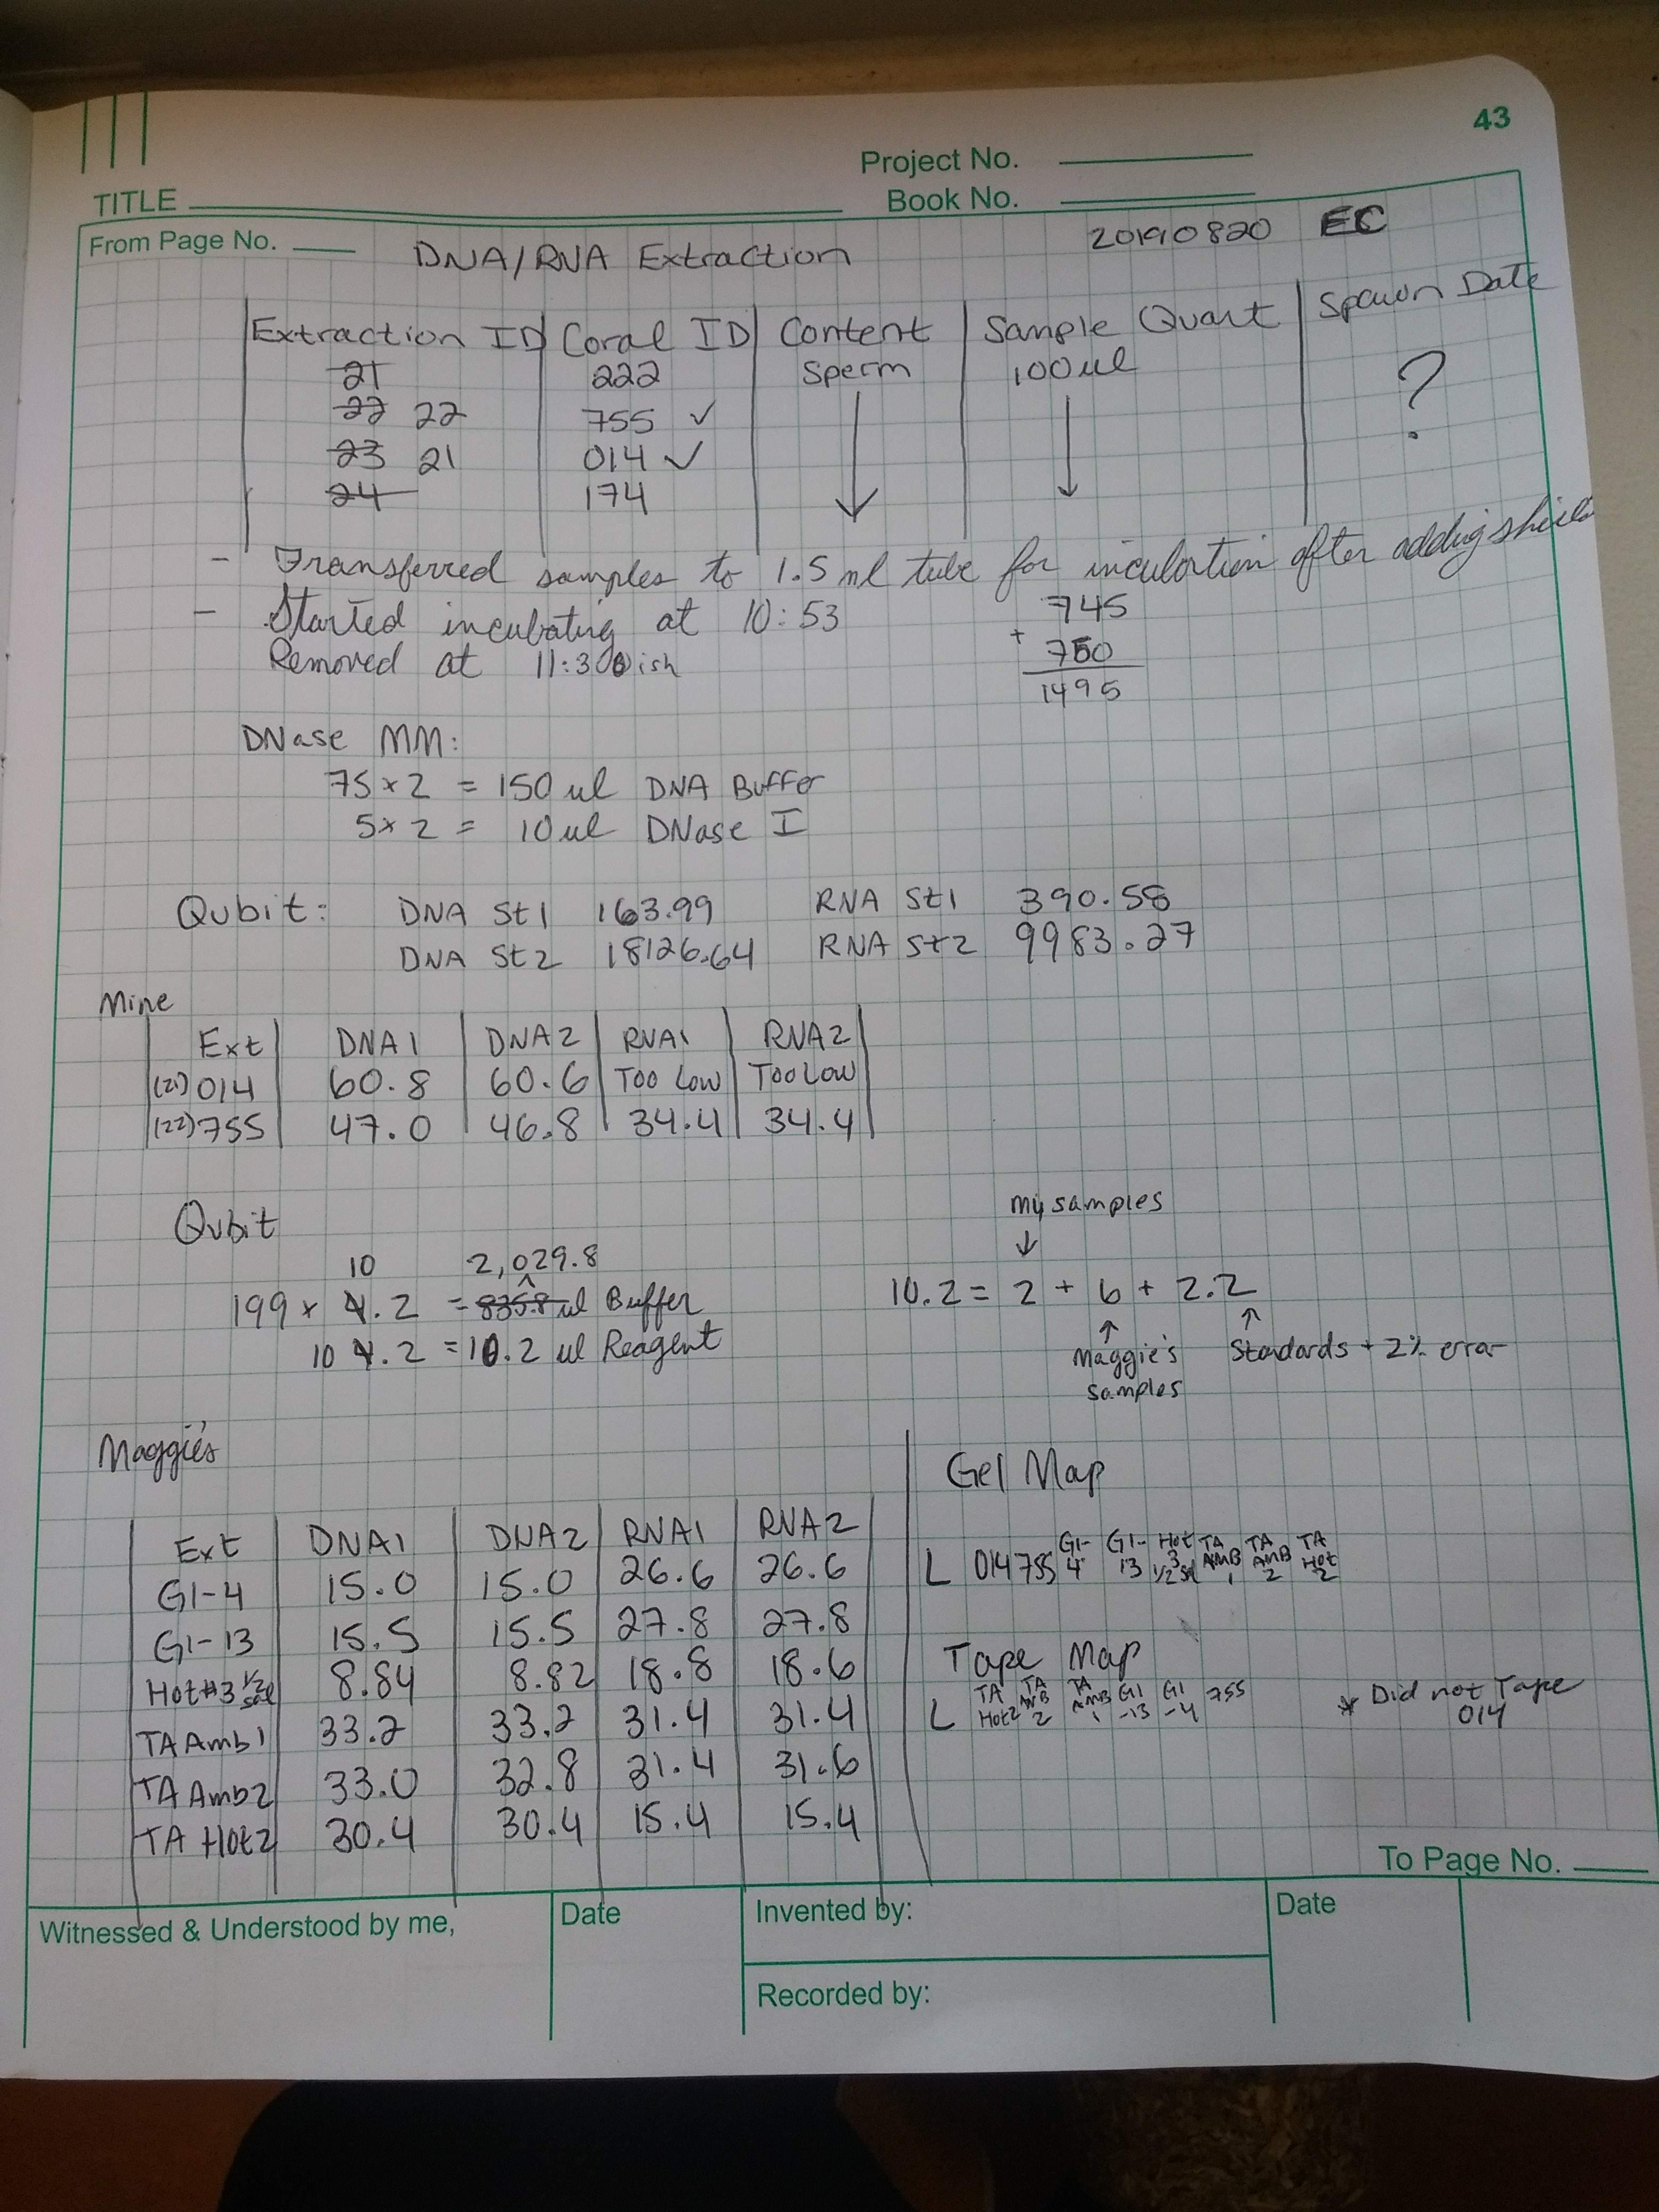 Lab_Notebook_20190820_Morea-FACE-PUF-batch-3